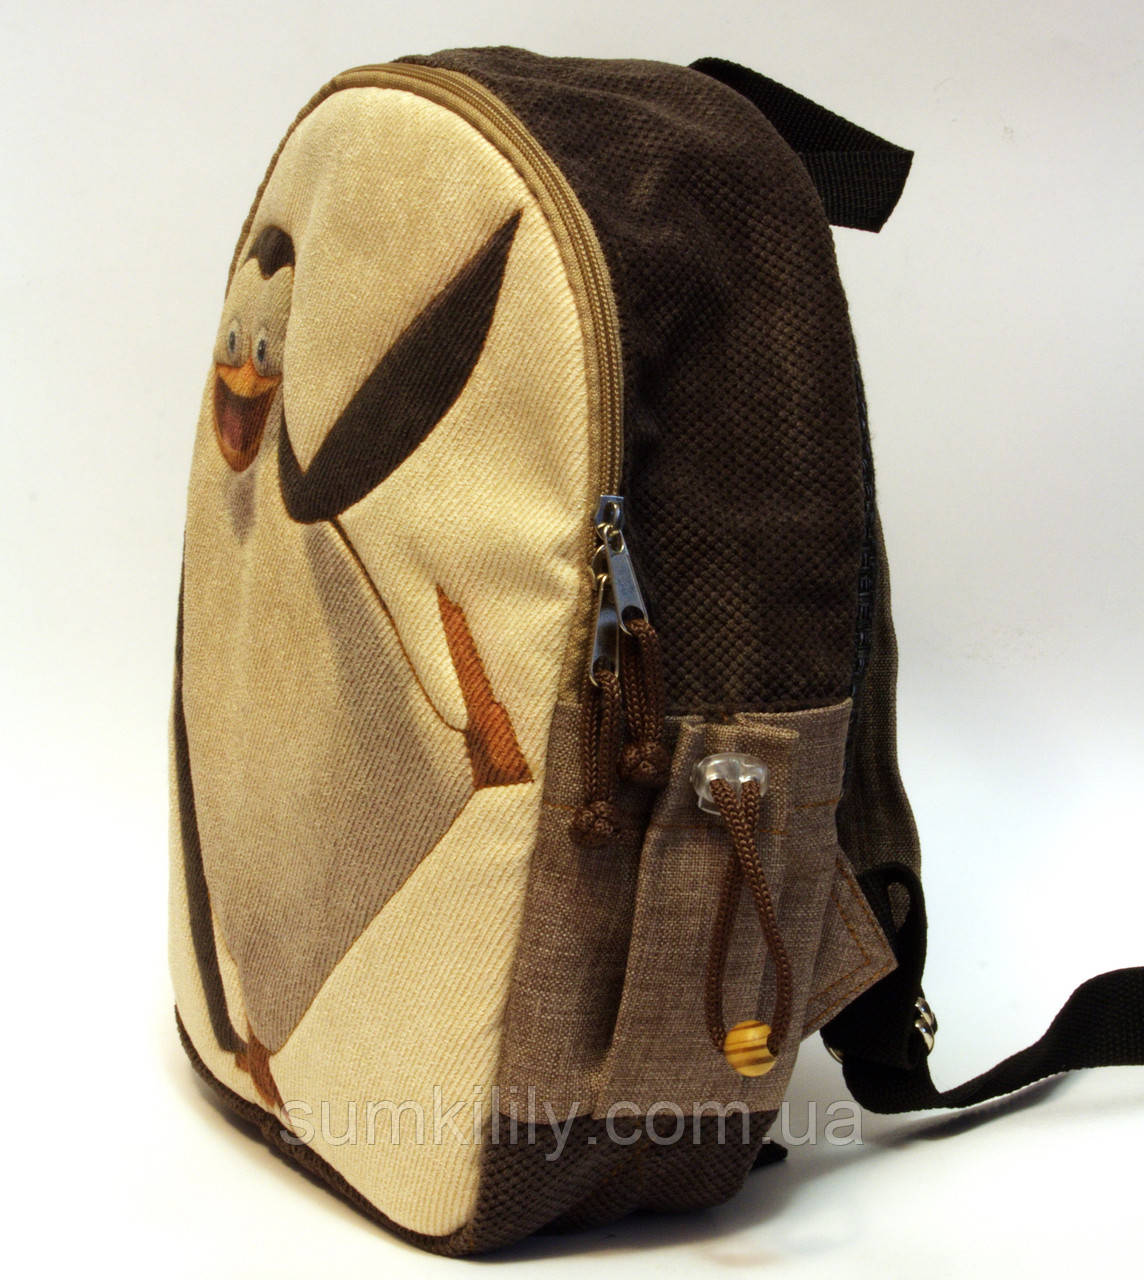 Рюкзаки модагаскар сумки чемоданы фирма ронкато